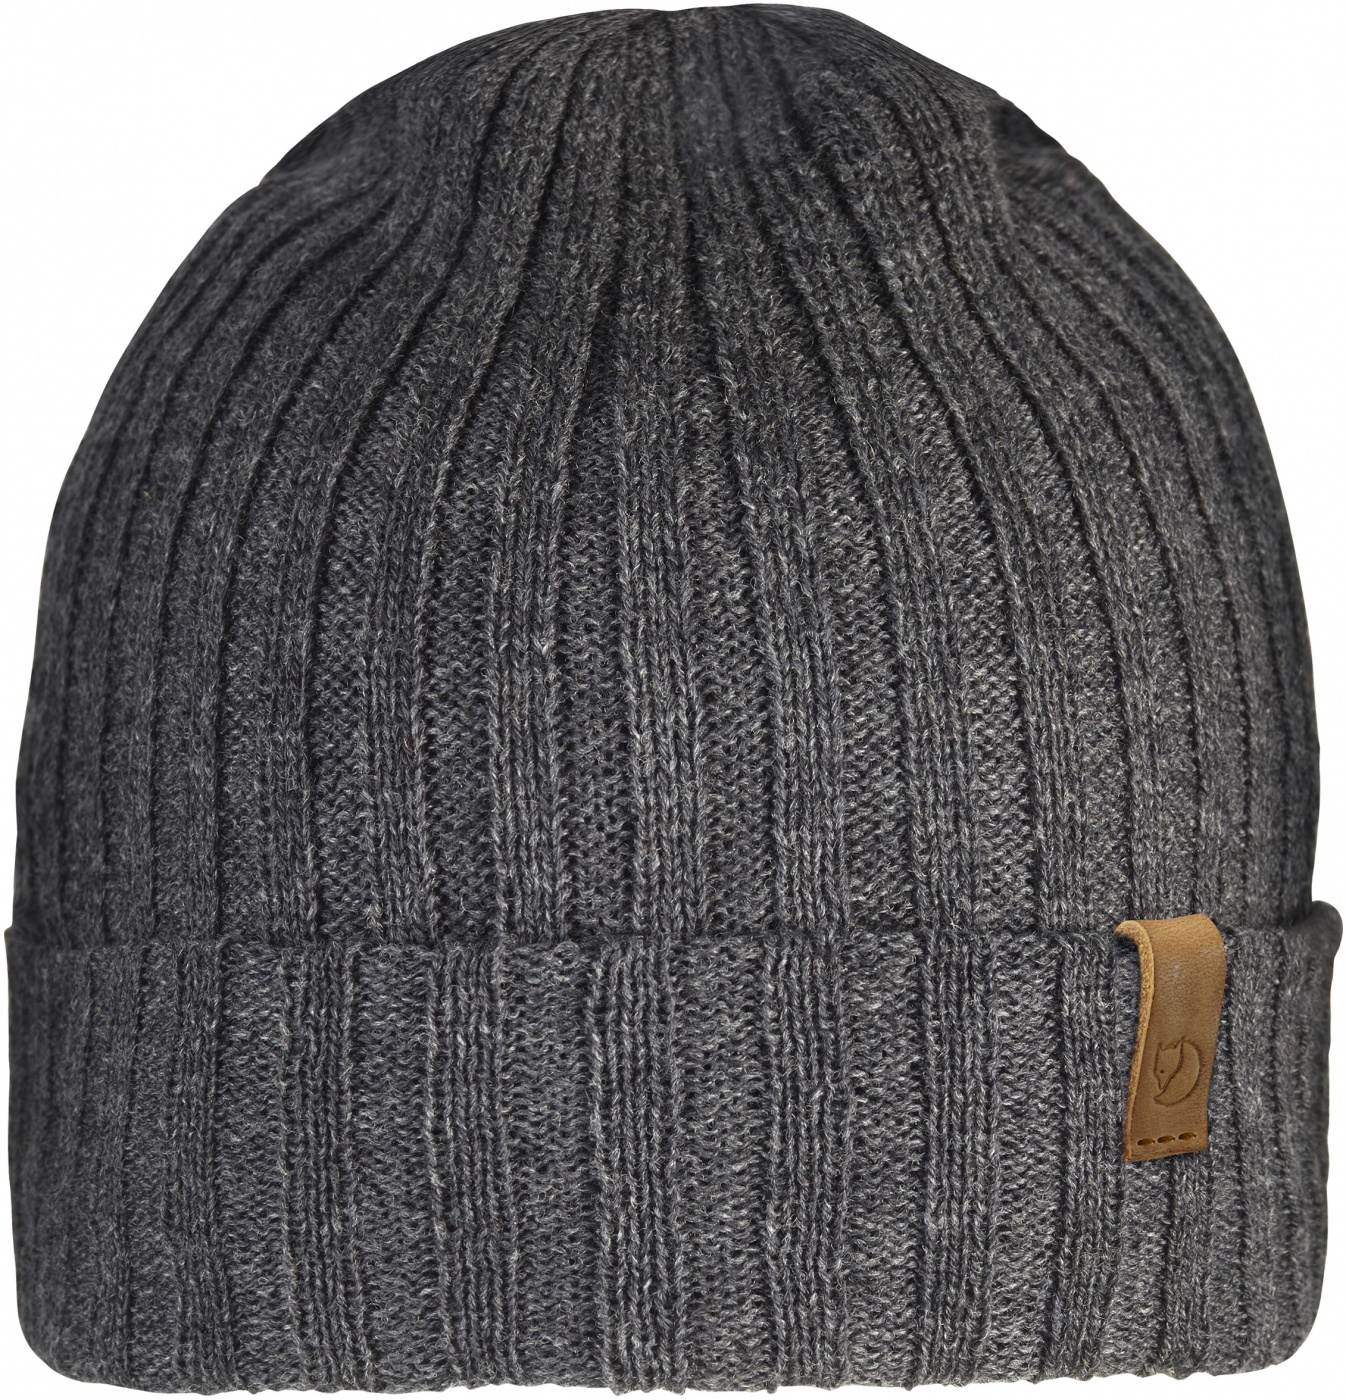 FjallRaven Byron Hat Thin Graphite-30